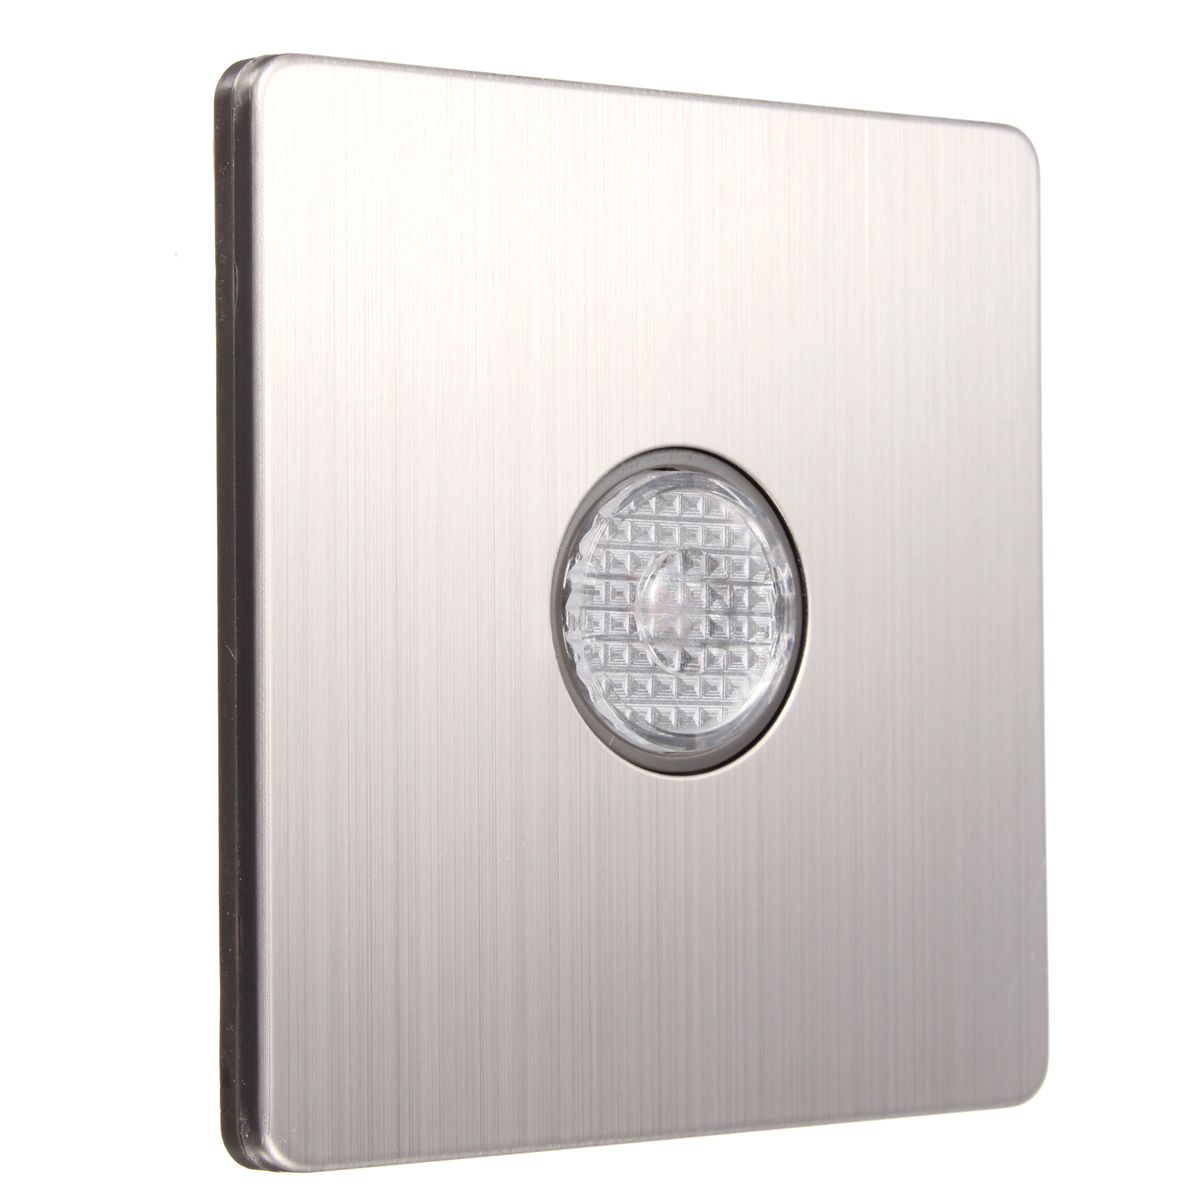 220v auto wall mount voice sound control light sensor switch controller socket ebay. Black Bedroom Furniture Sets. Home Design Ideas